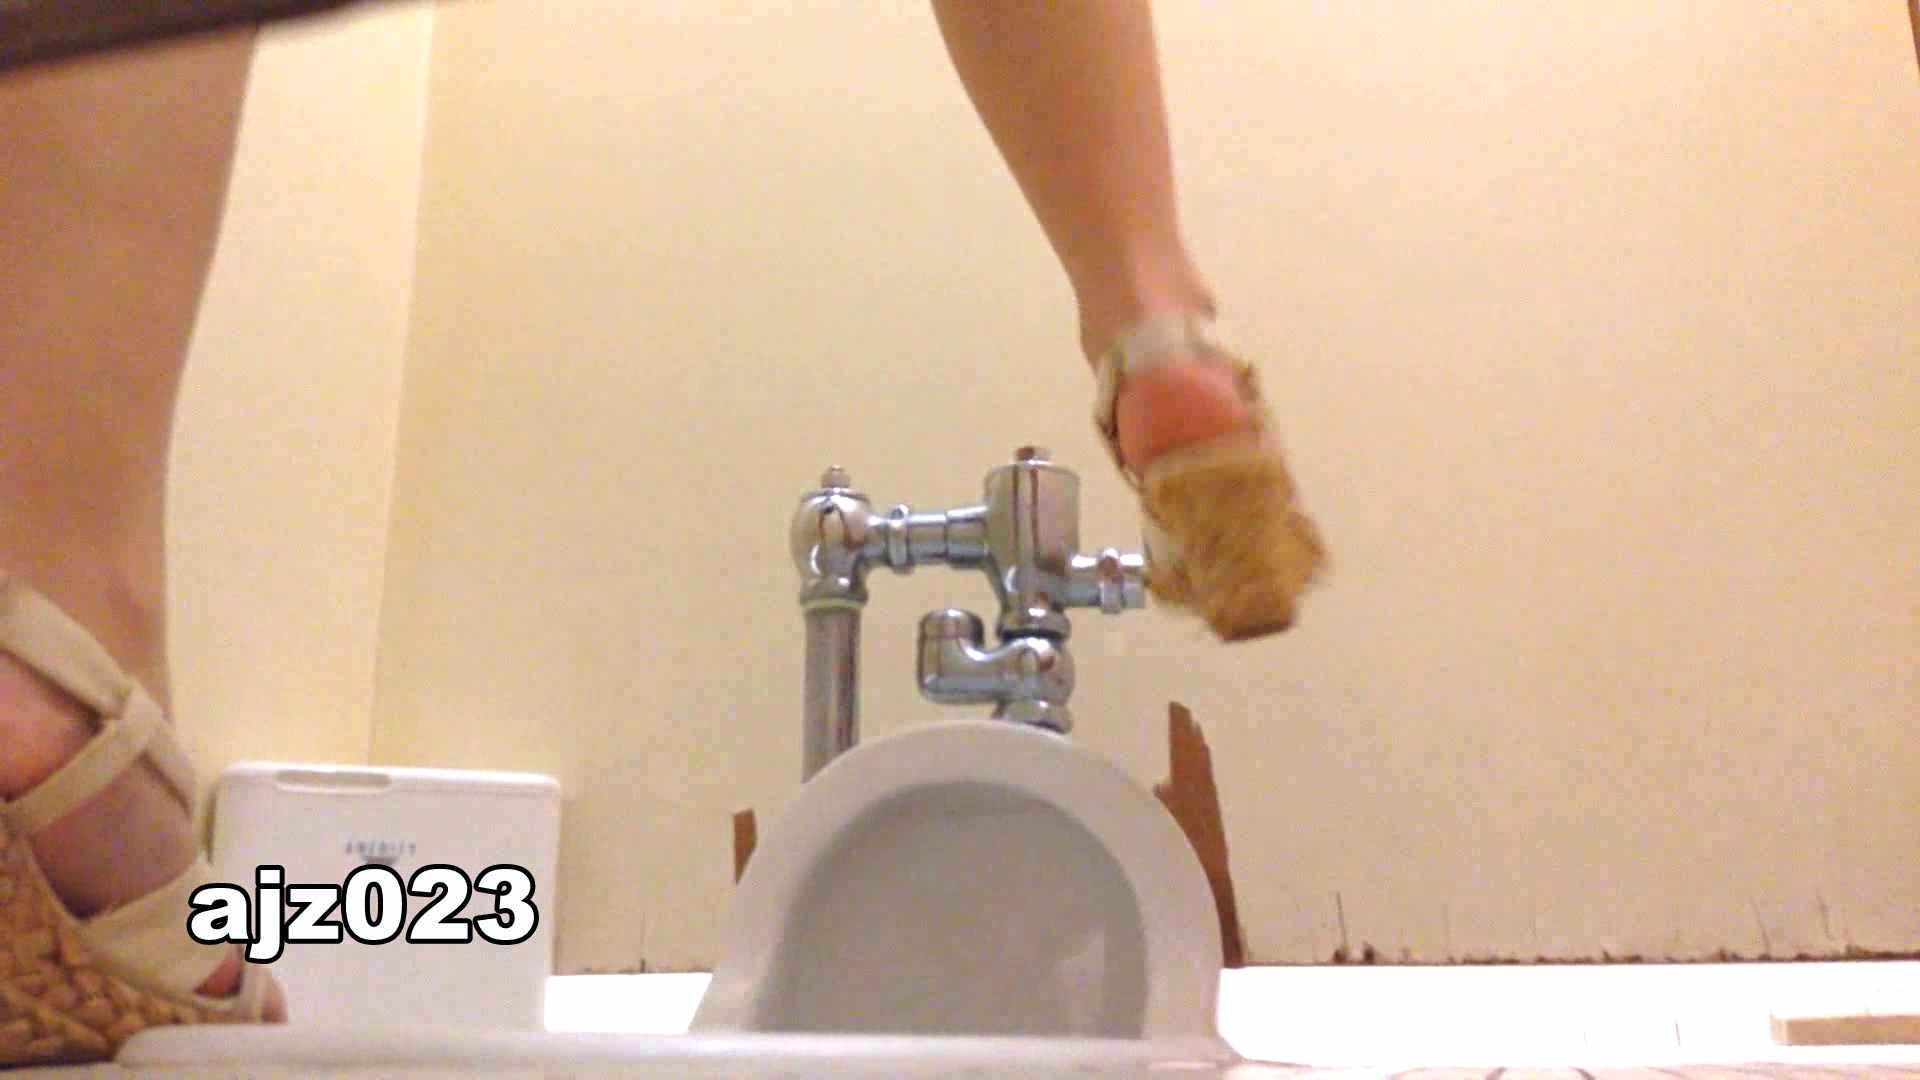 某有名大学女性洗面所 vol.23 洗面所 隠し撮りオマンコ動画紹介 101画像 7